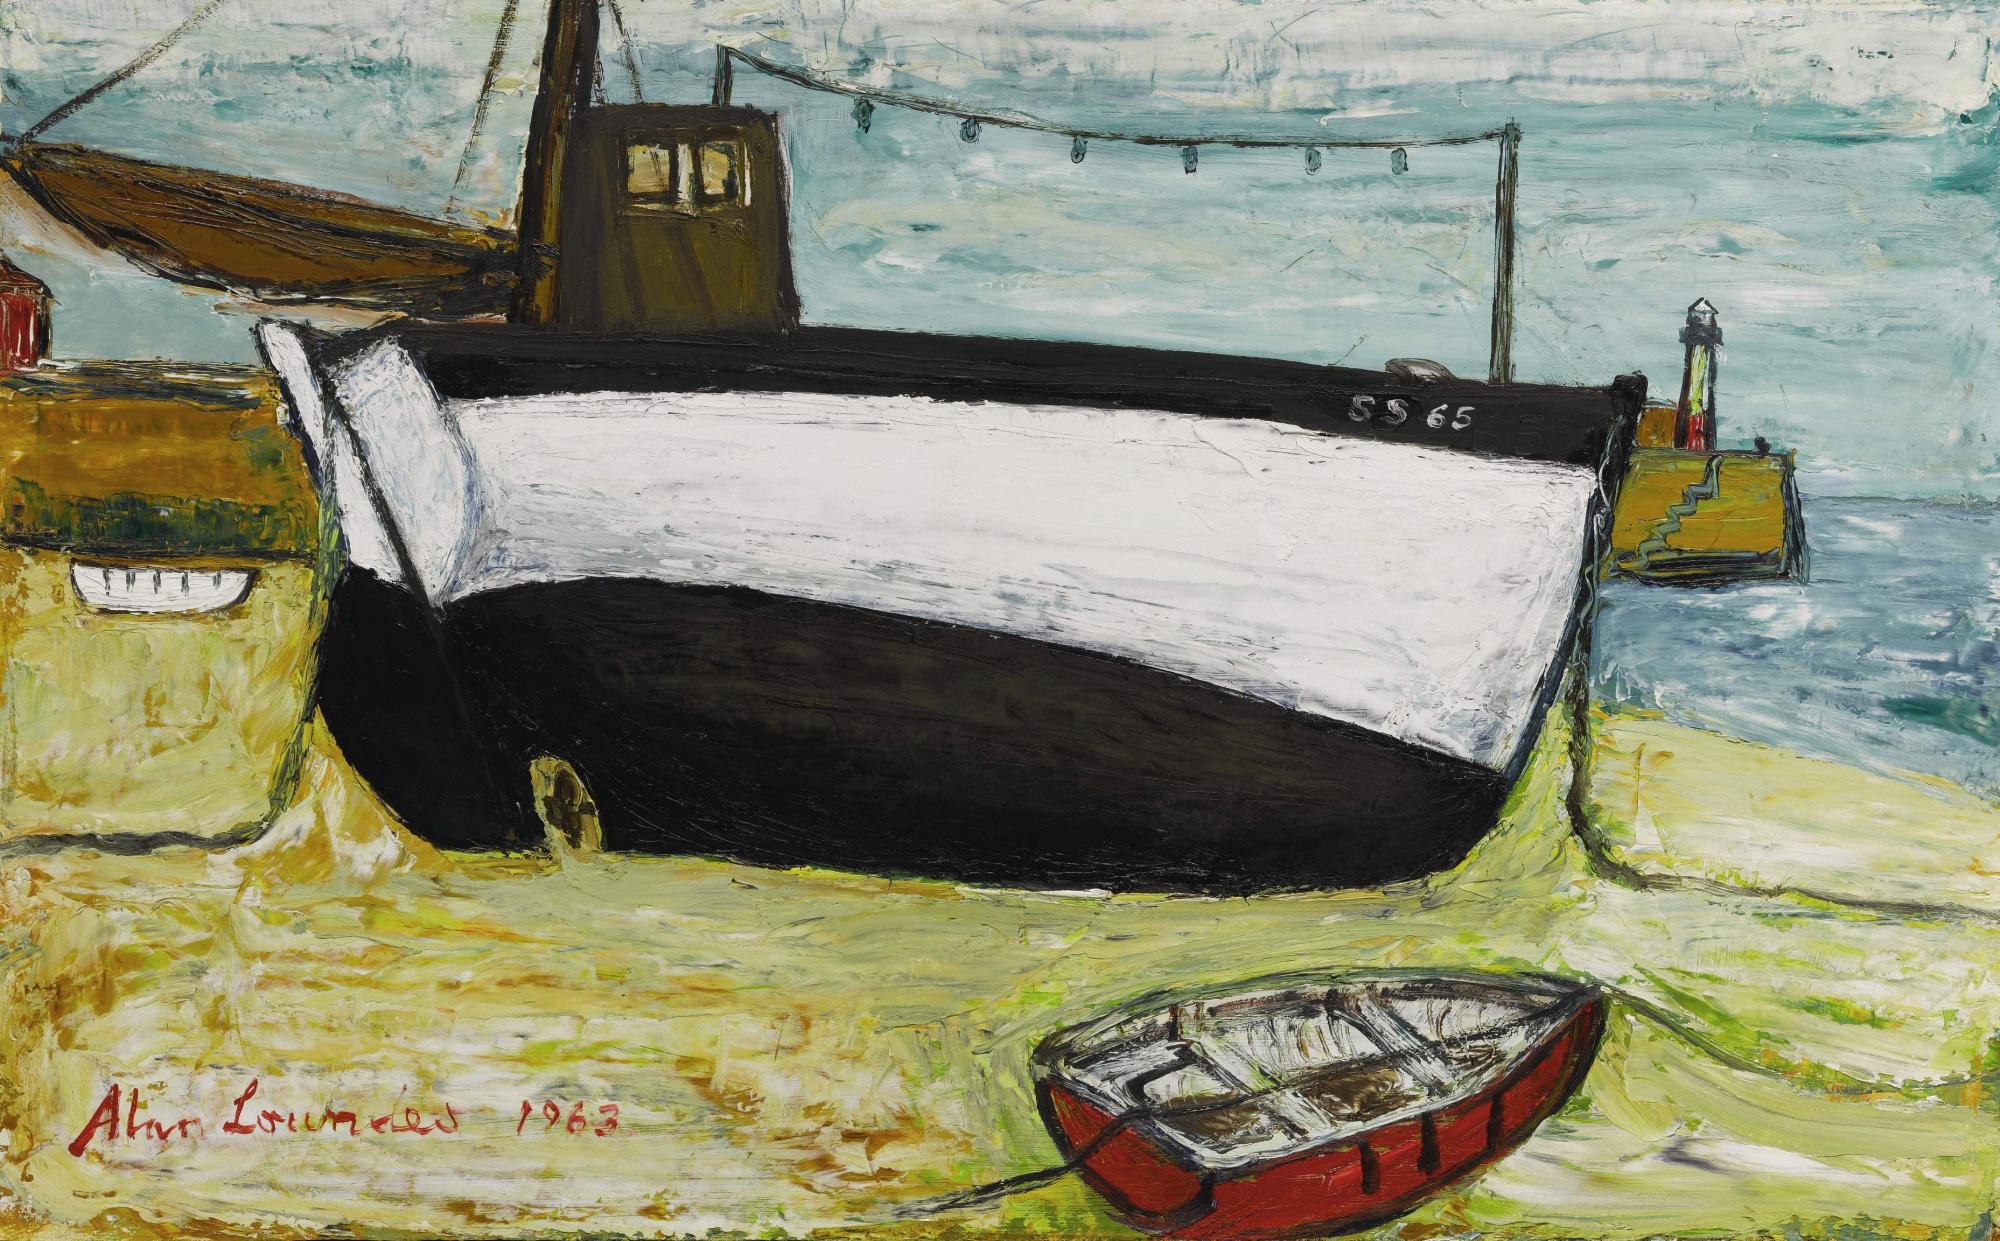 Alan Lowndes-S.S. 65-1963